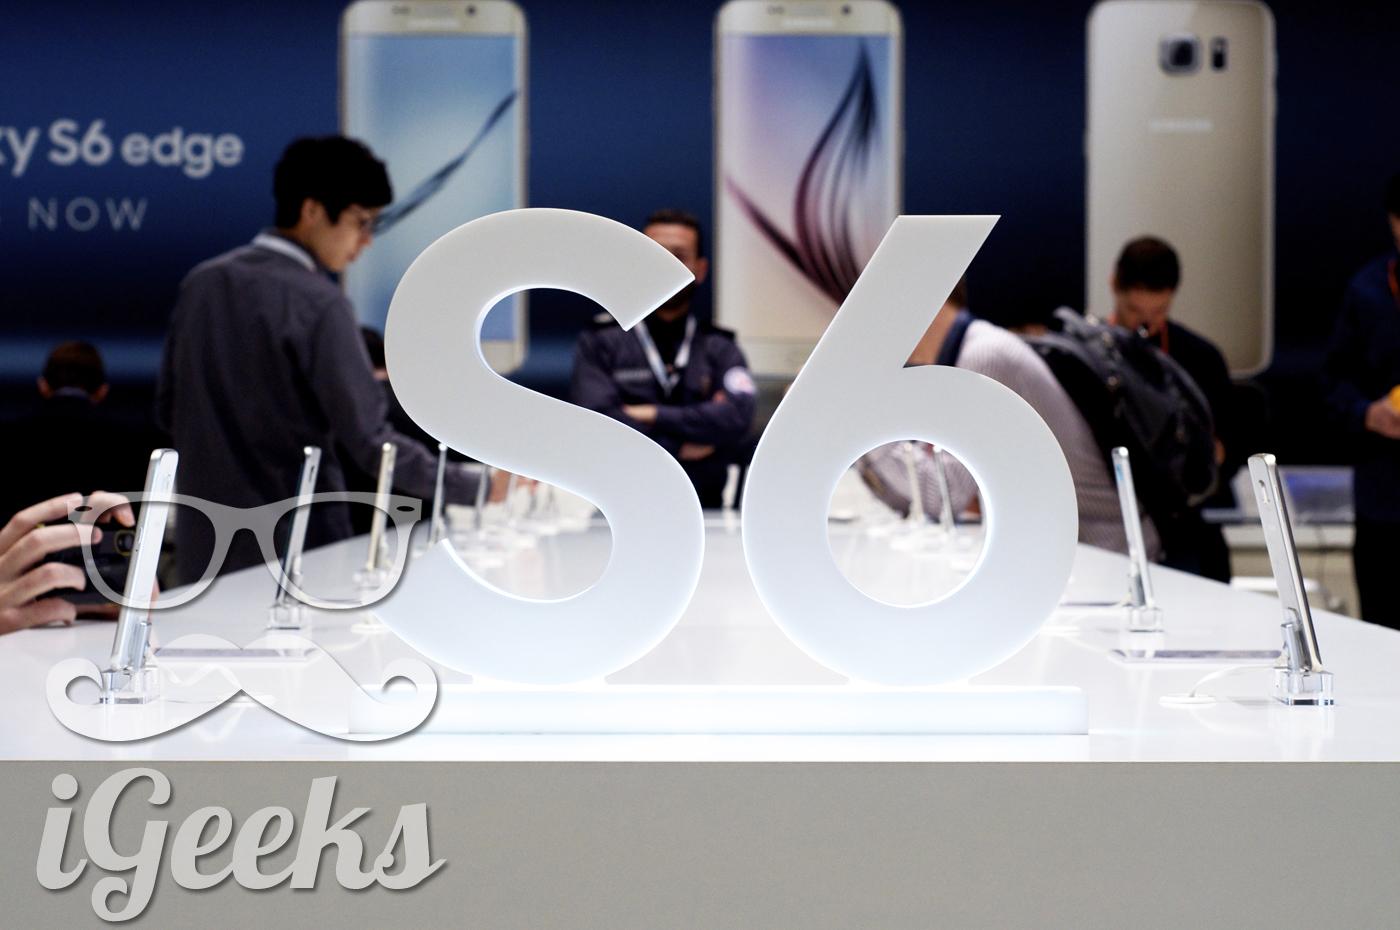 iGeeks-Samsung-S6-MWC2015-34